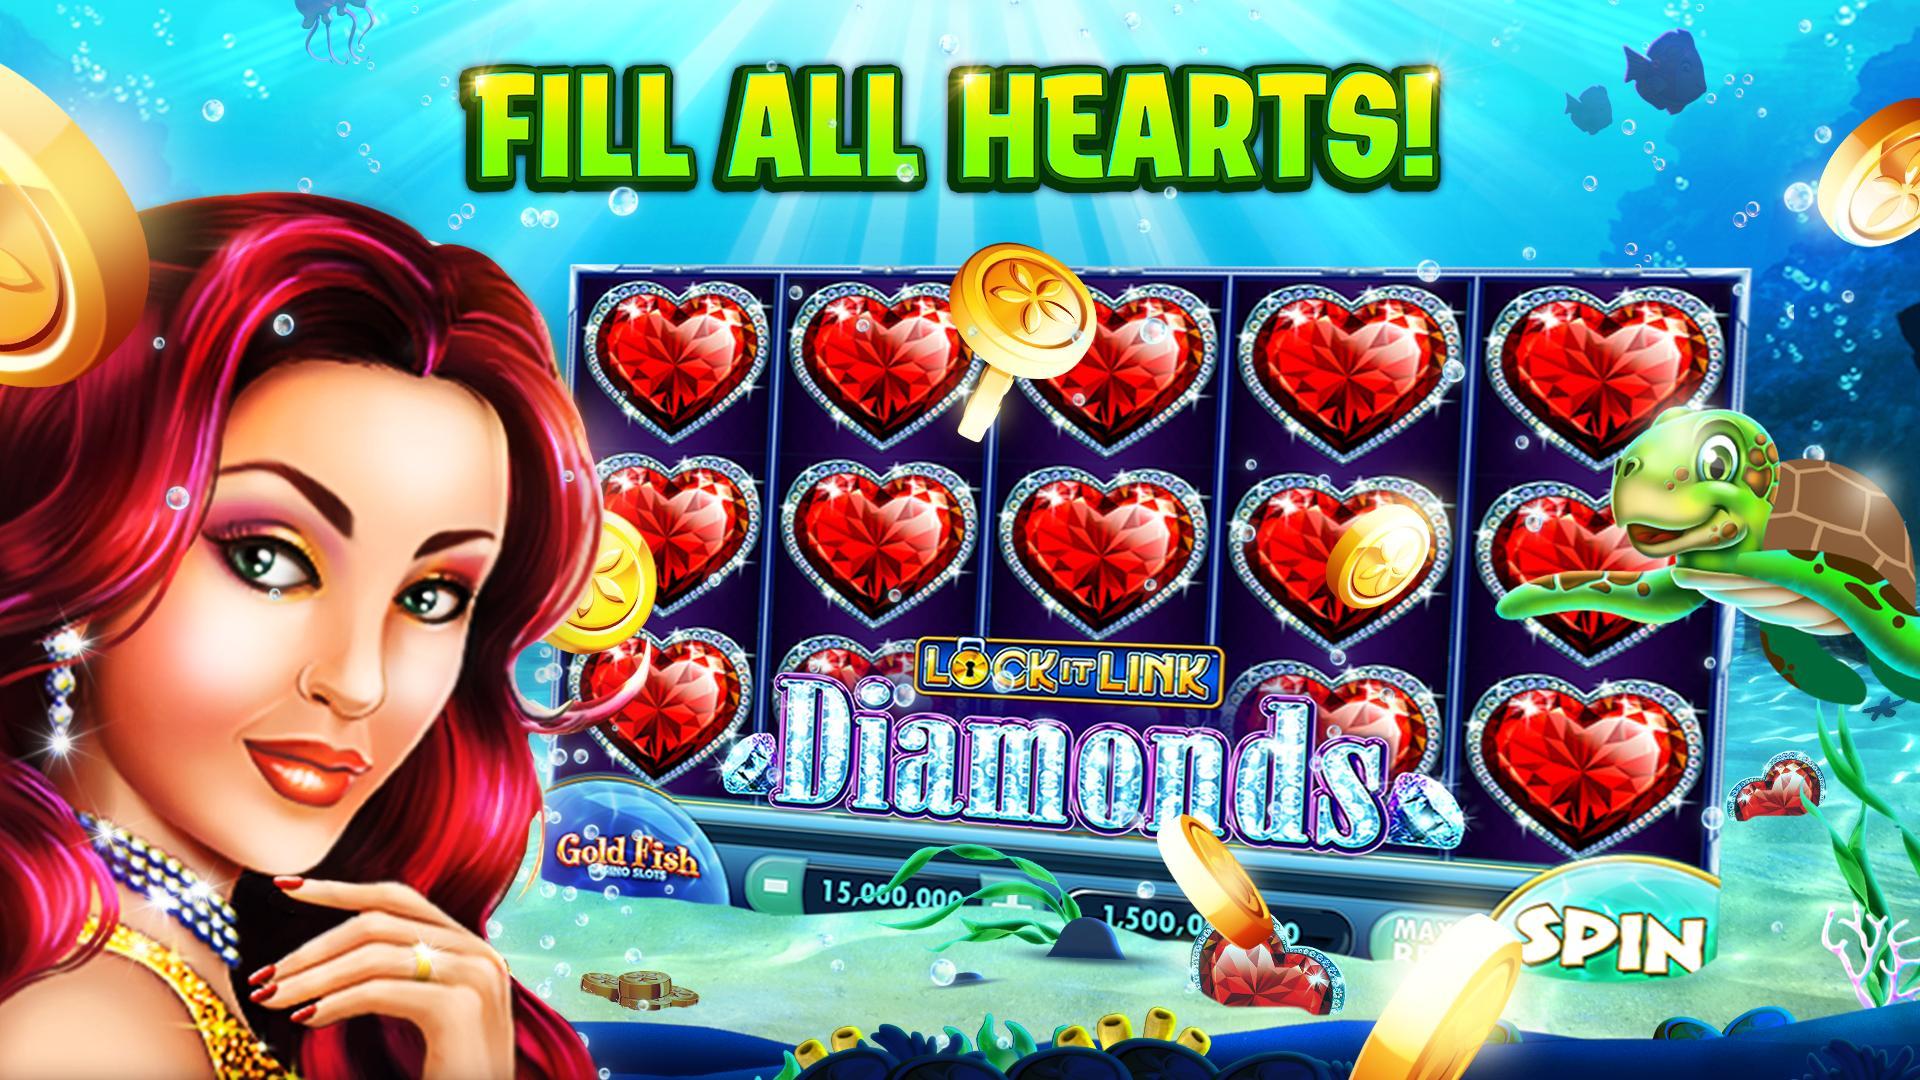 Gold Fish Casino Slots - FREE Slot Machine Games 25.09.00 Screenshot 16